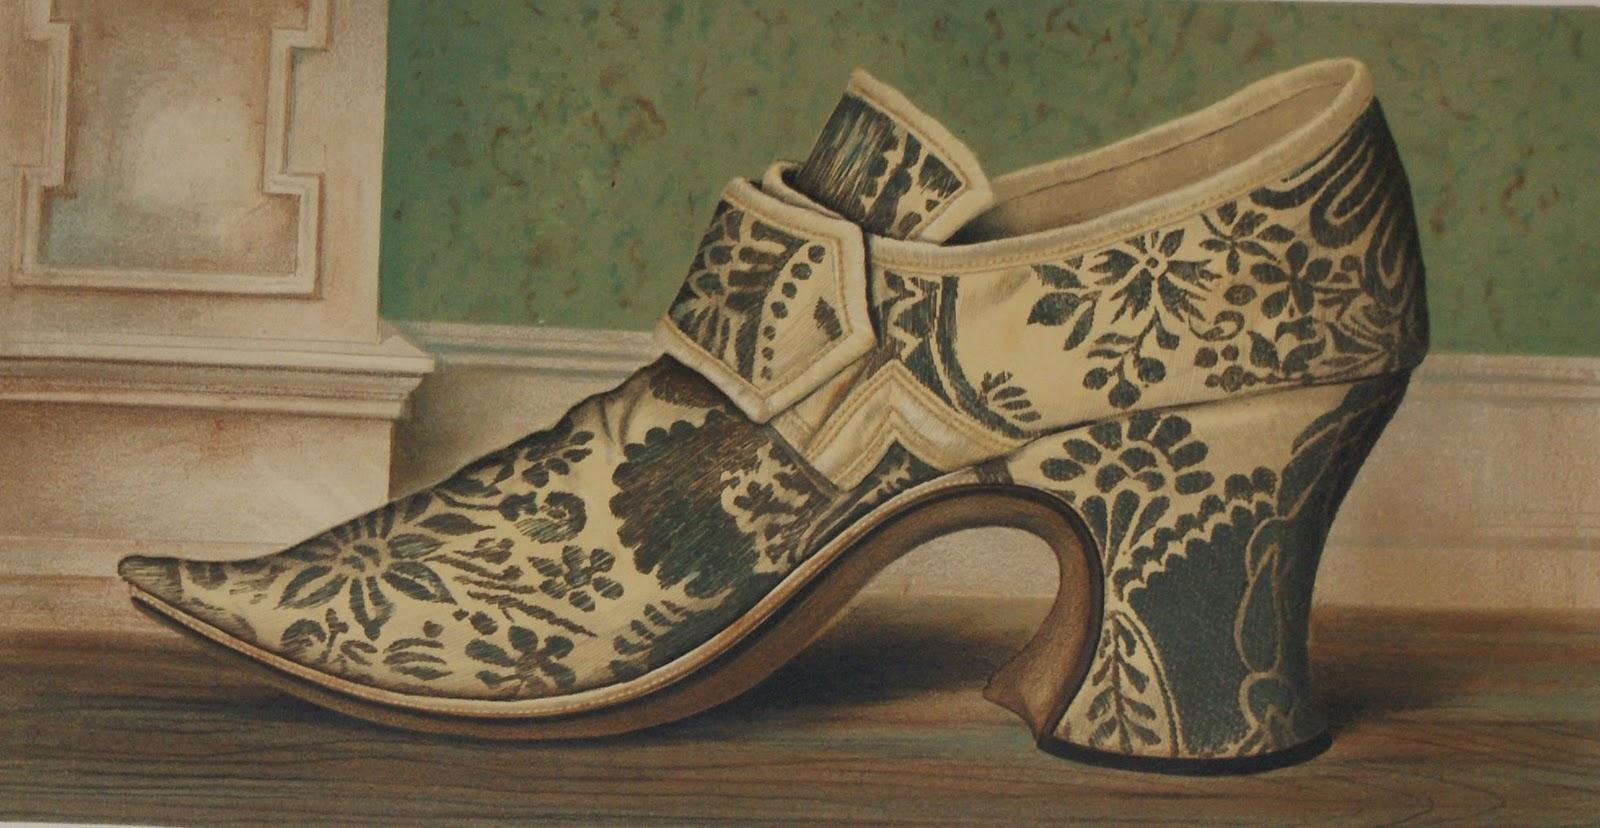 booktryst confessions of a vintage shoe fetishist